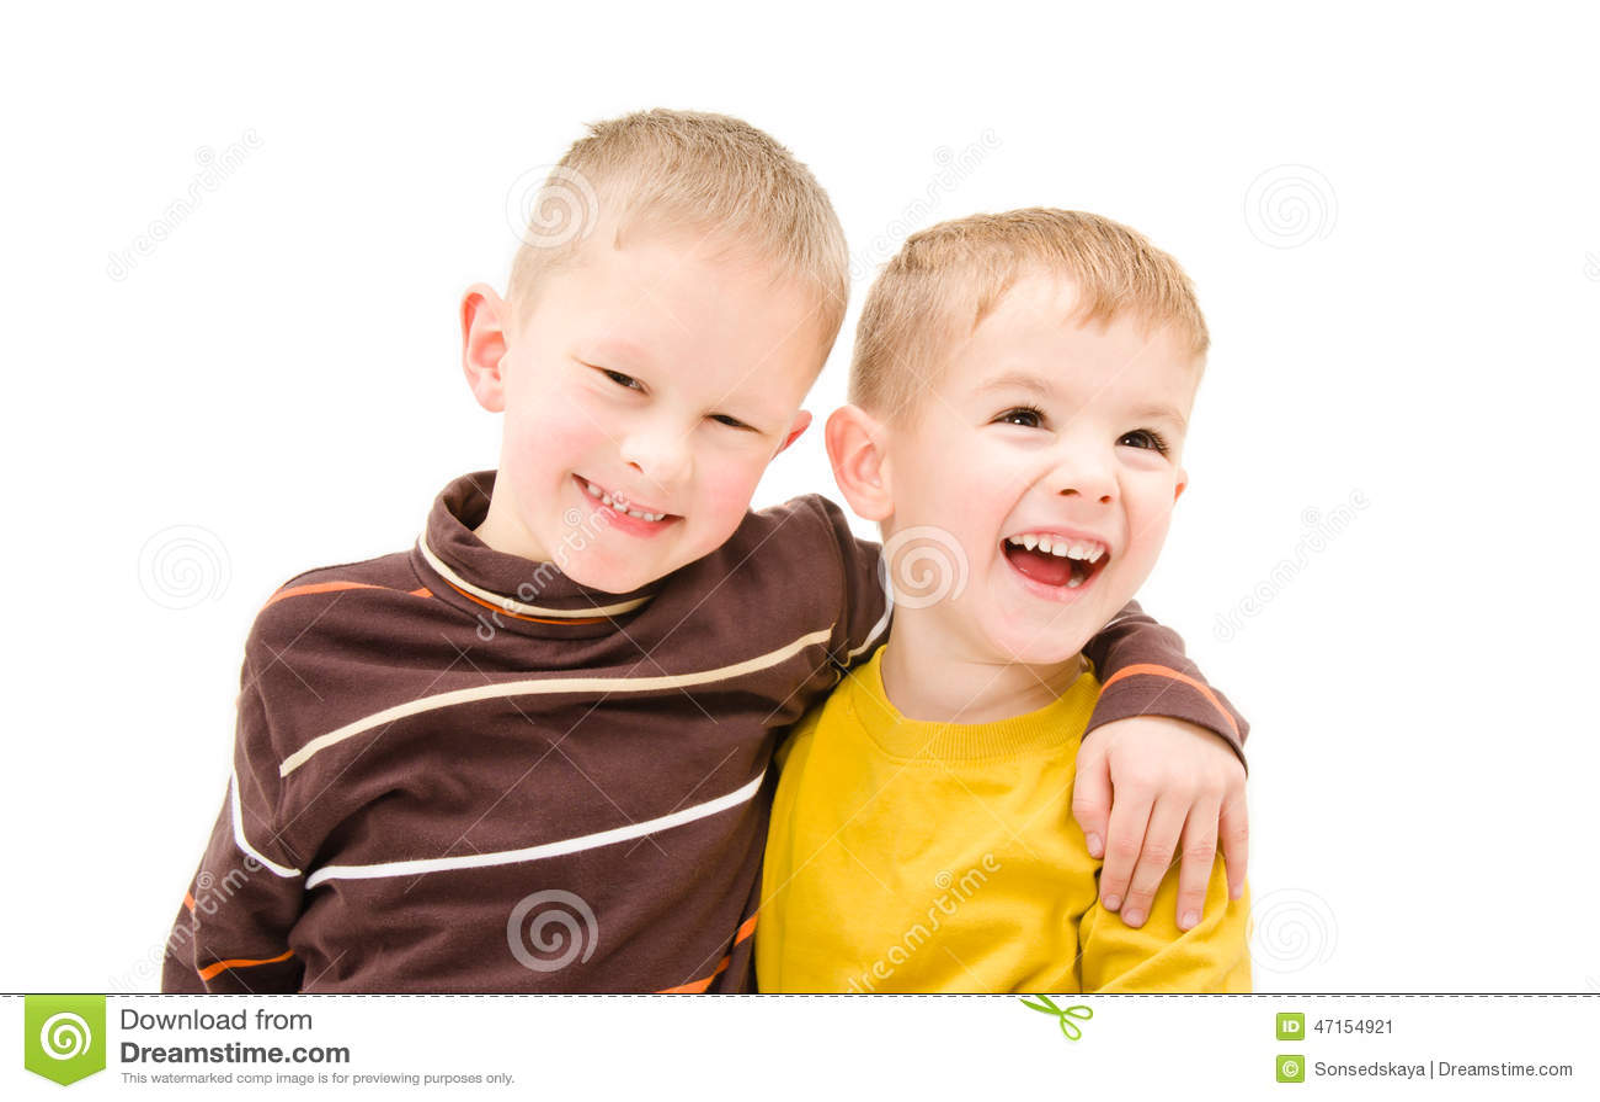 Dois meninos felizes